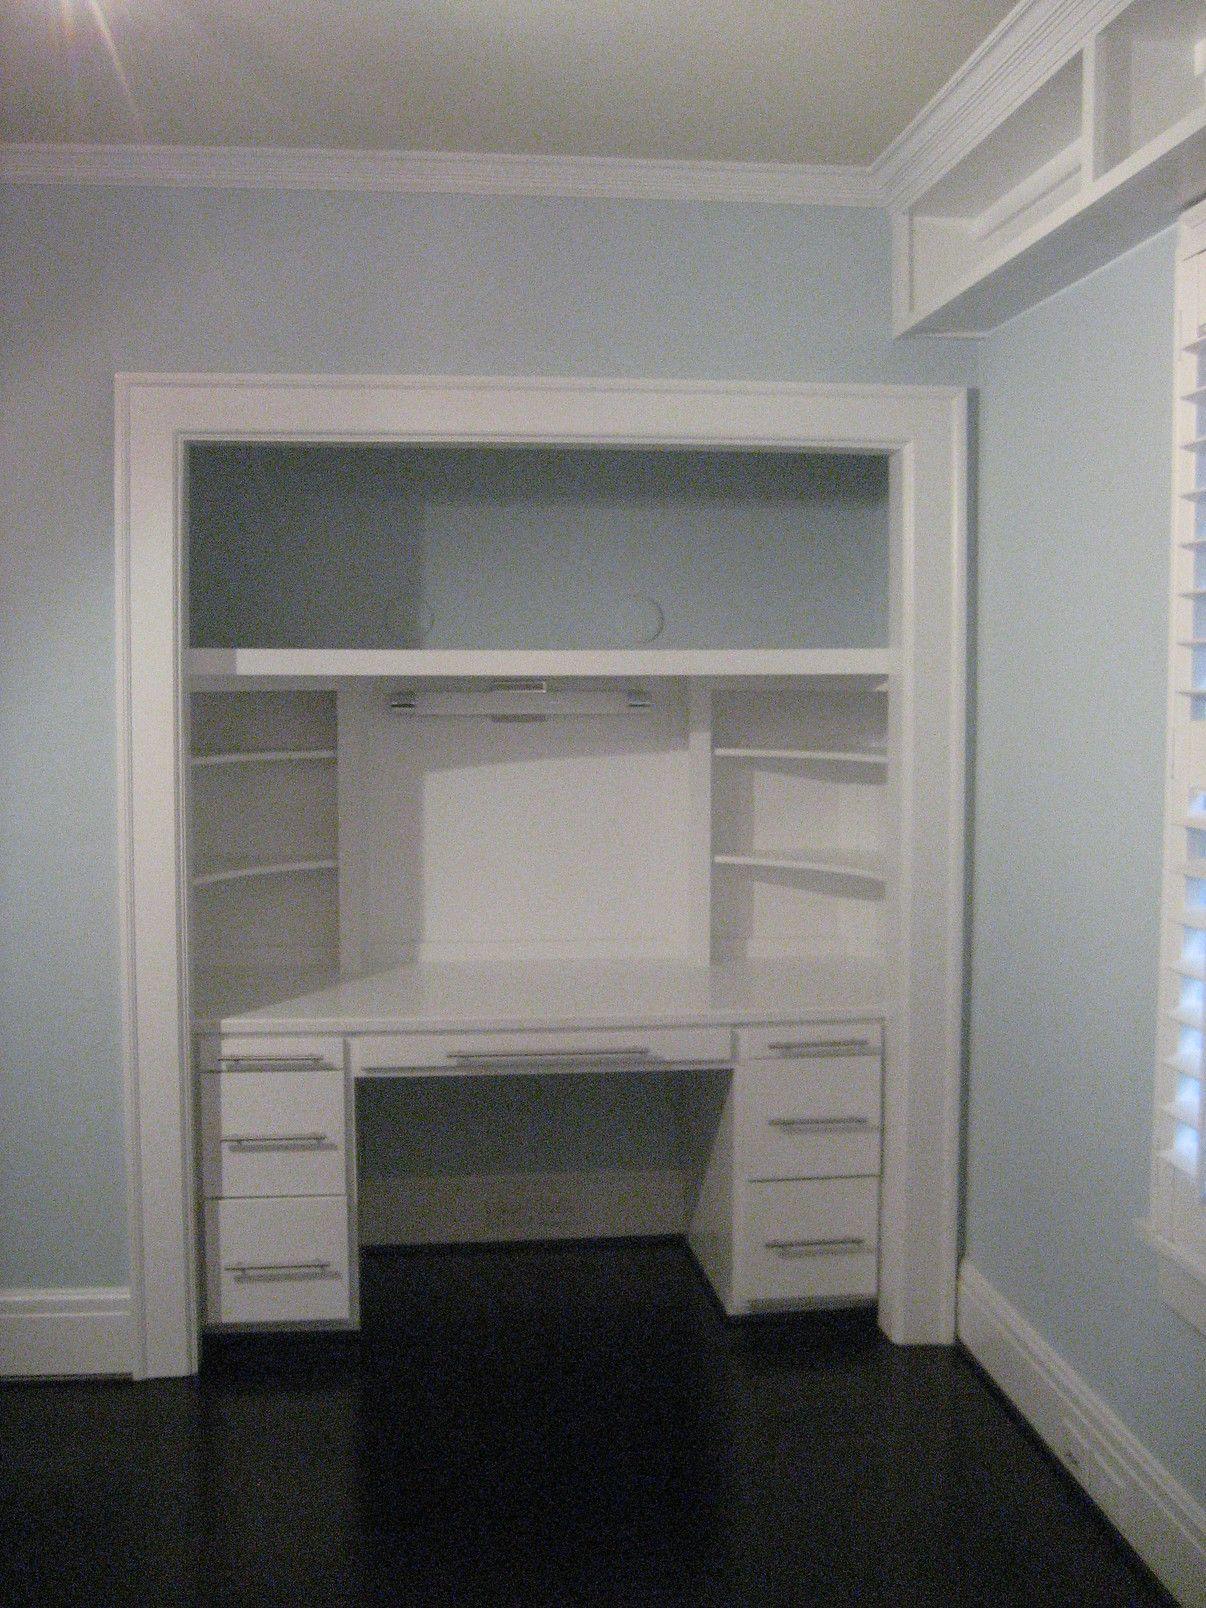 & Niches CarolinaBuildingServices Shelves